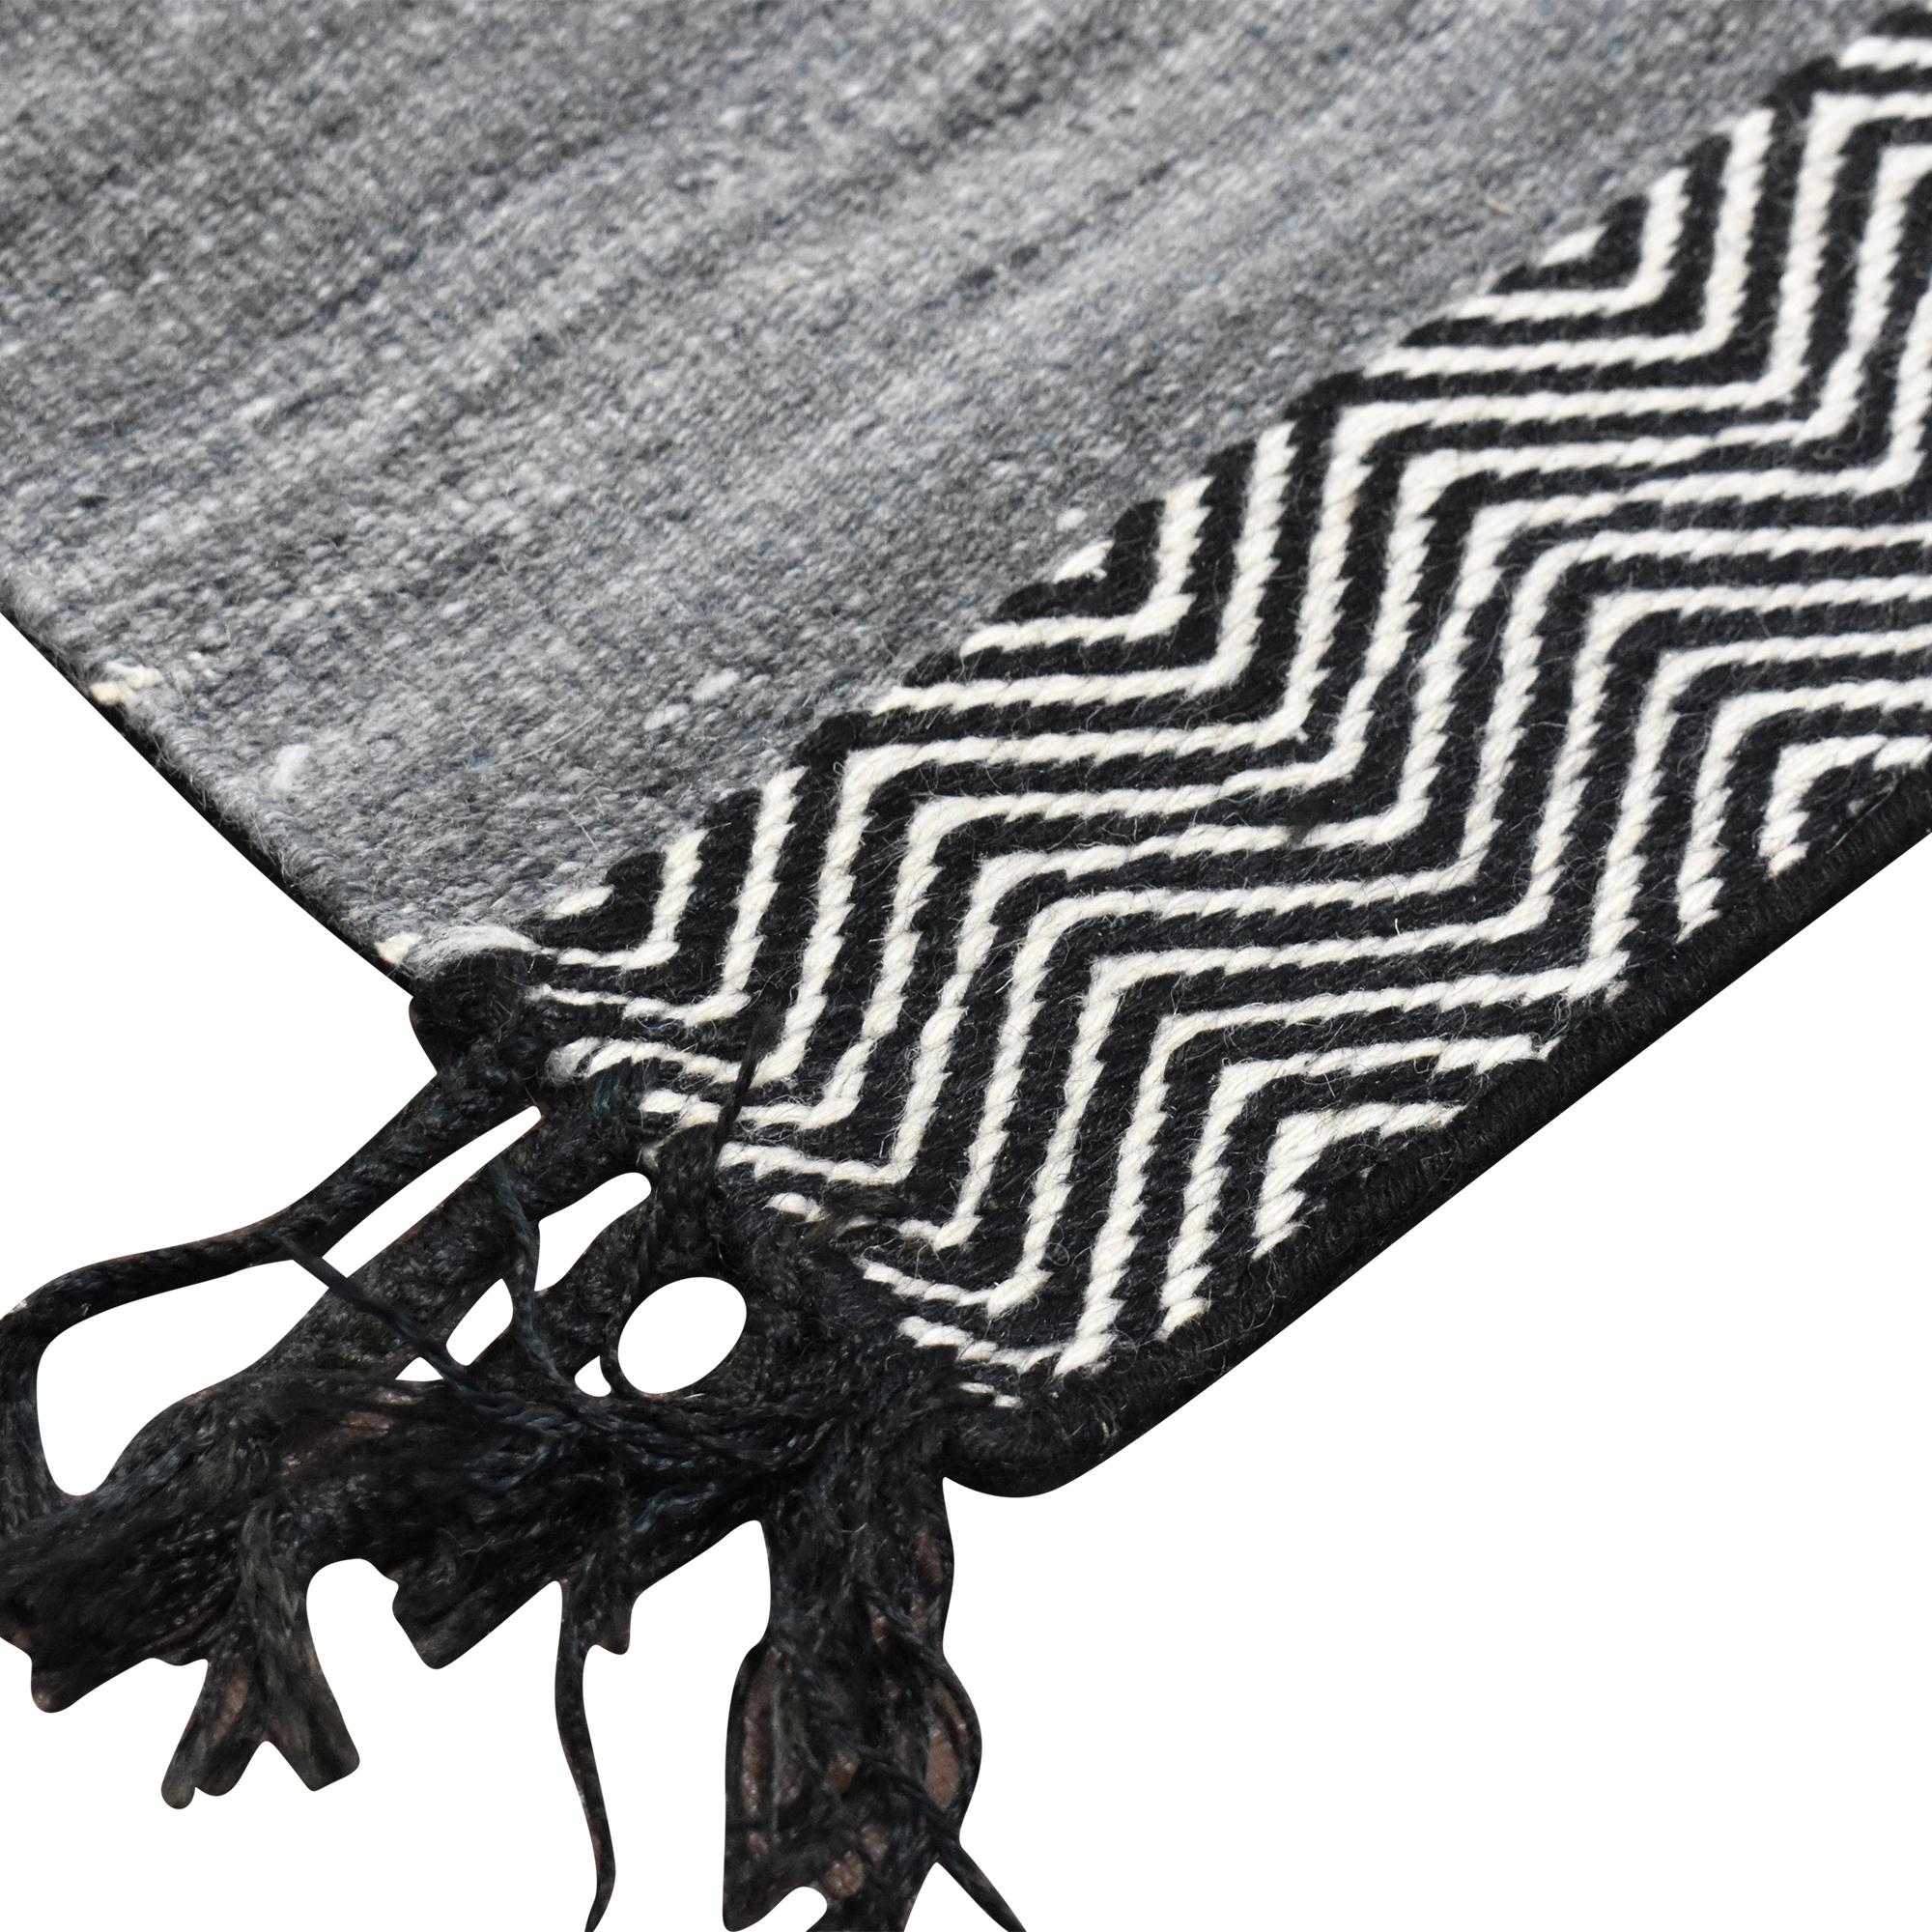 ABC Carpet & Home ABC Carpet & Home Flat Weave Area Rug ct